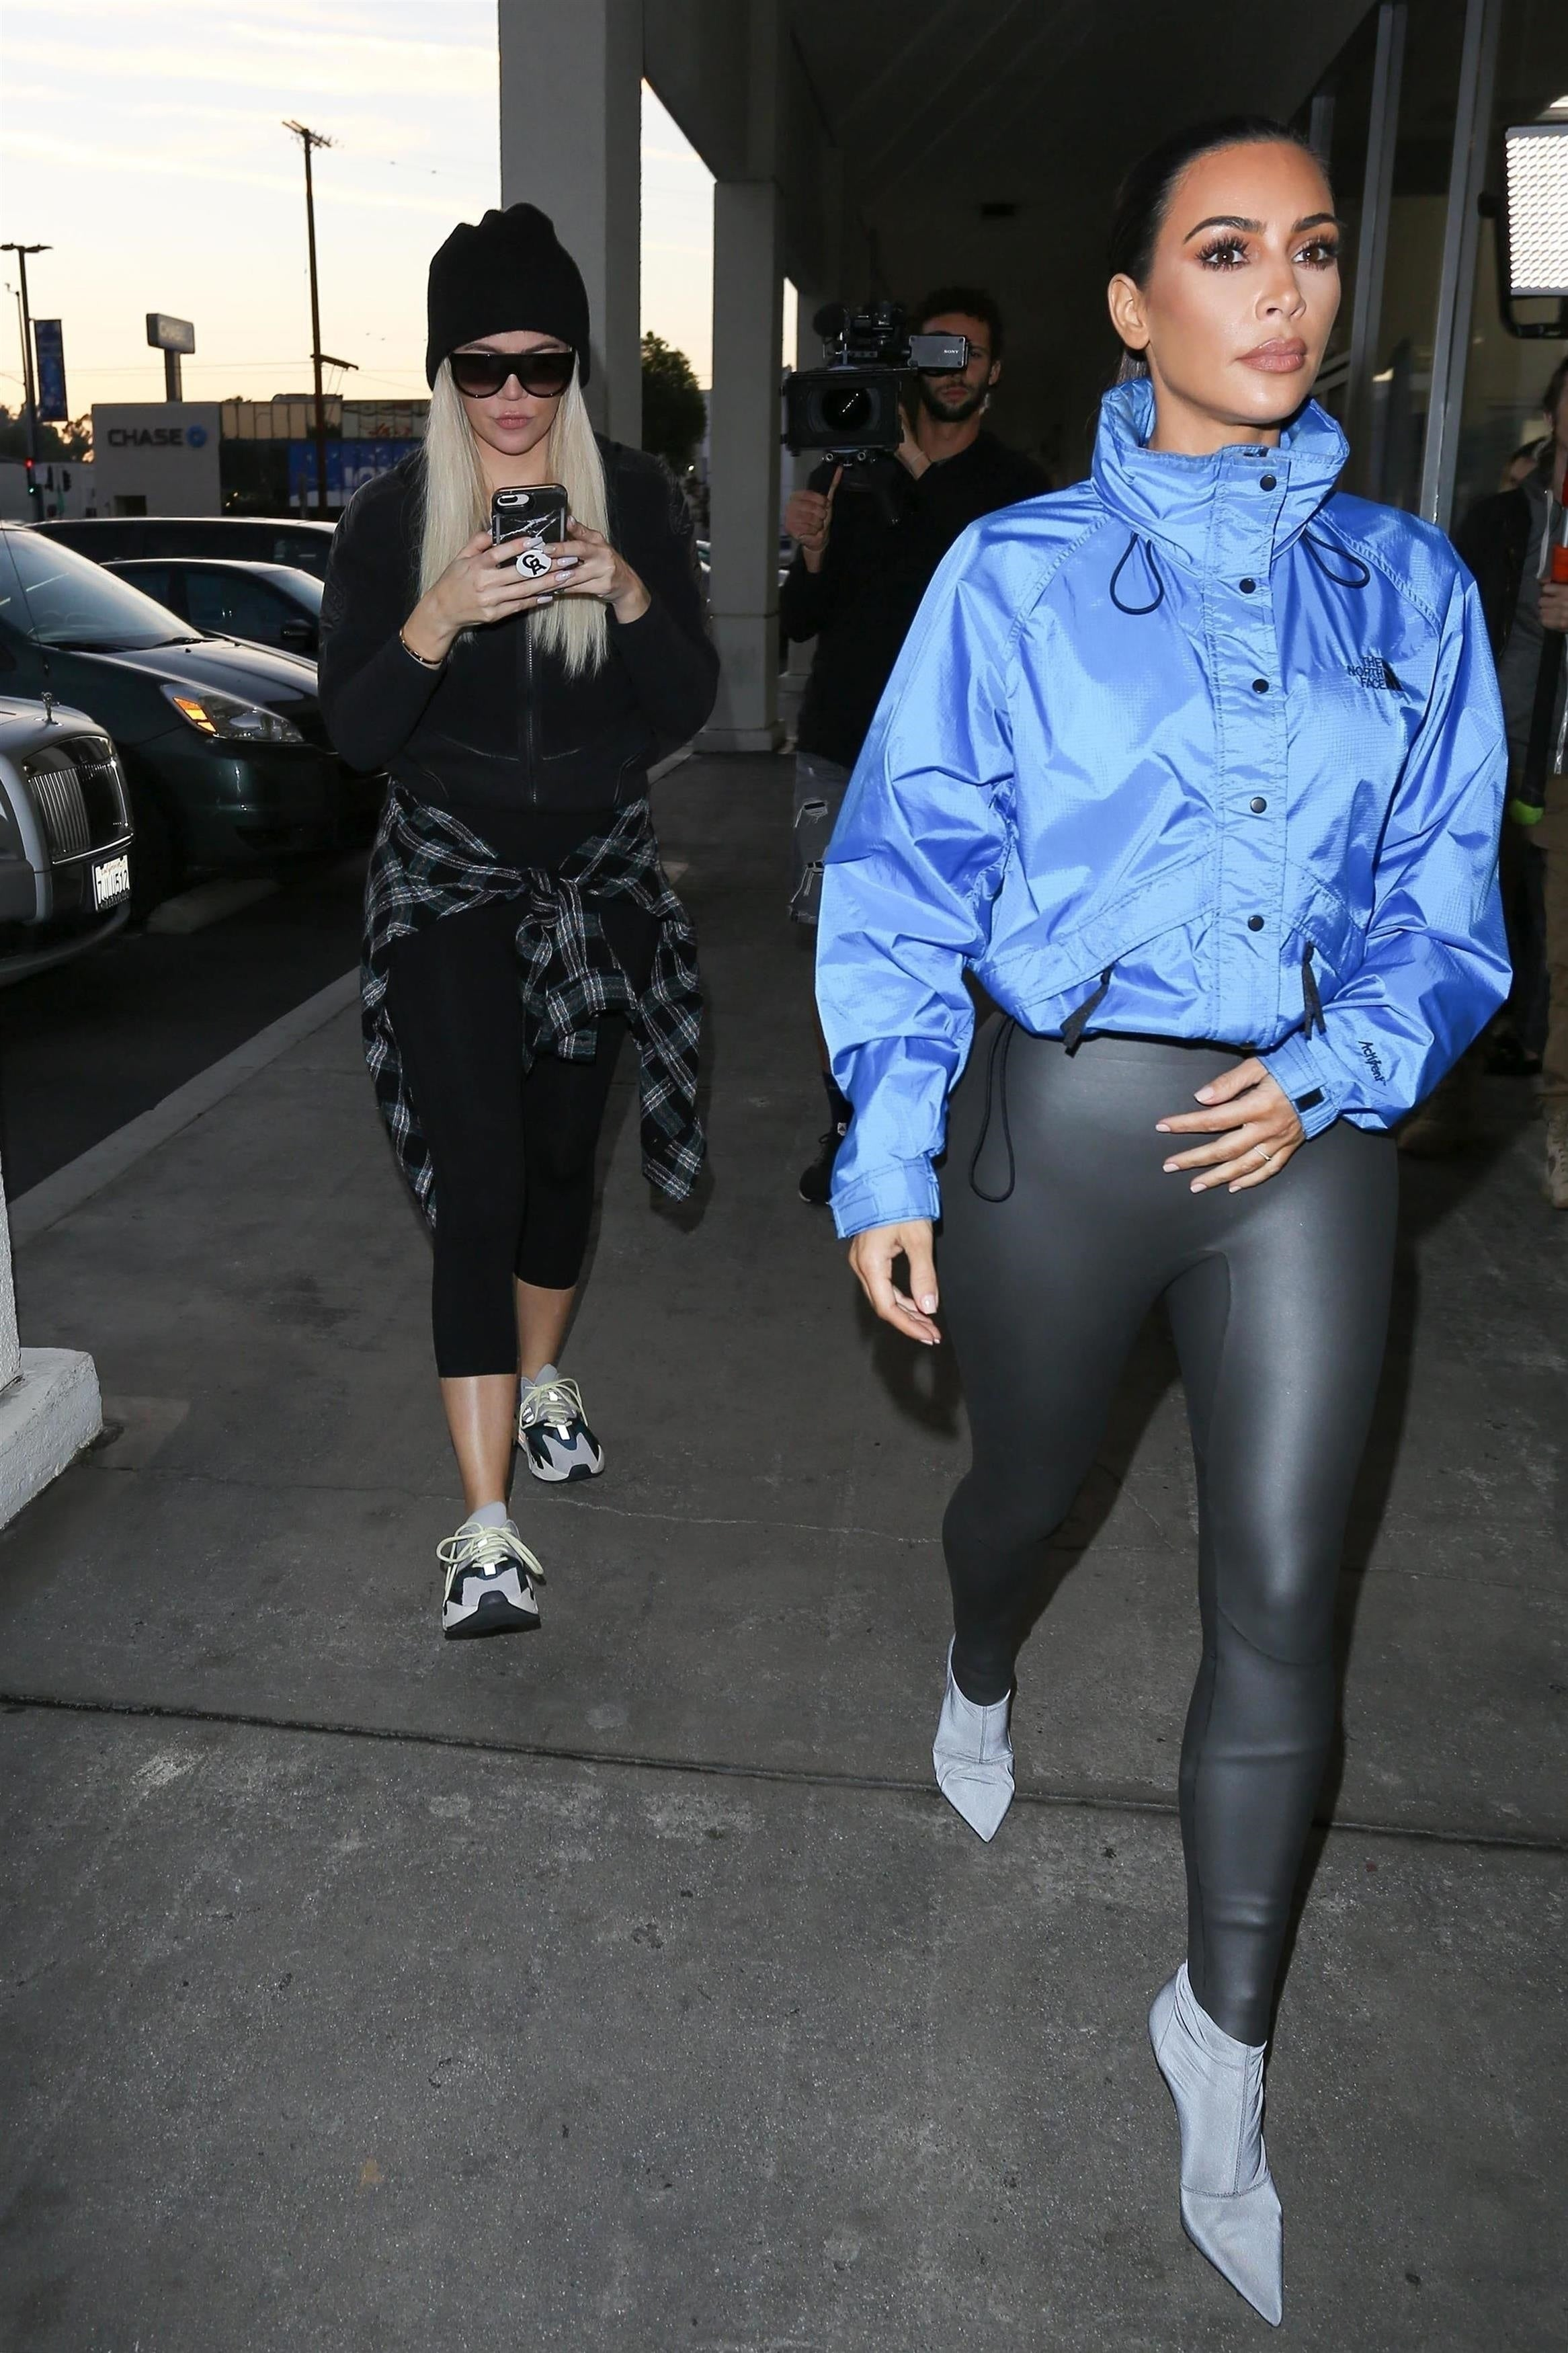 e3f20f3592113 Kim Kardashian Looks Incredible in Skin-Tight Rubber Leggings With Sister  Khloe